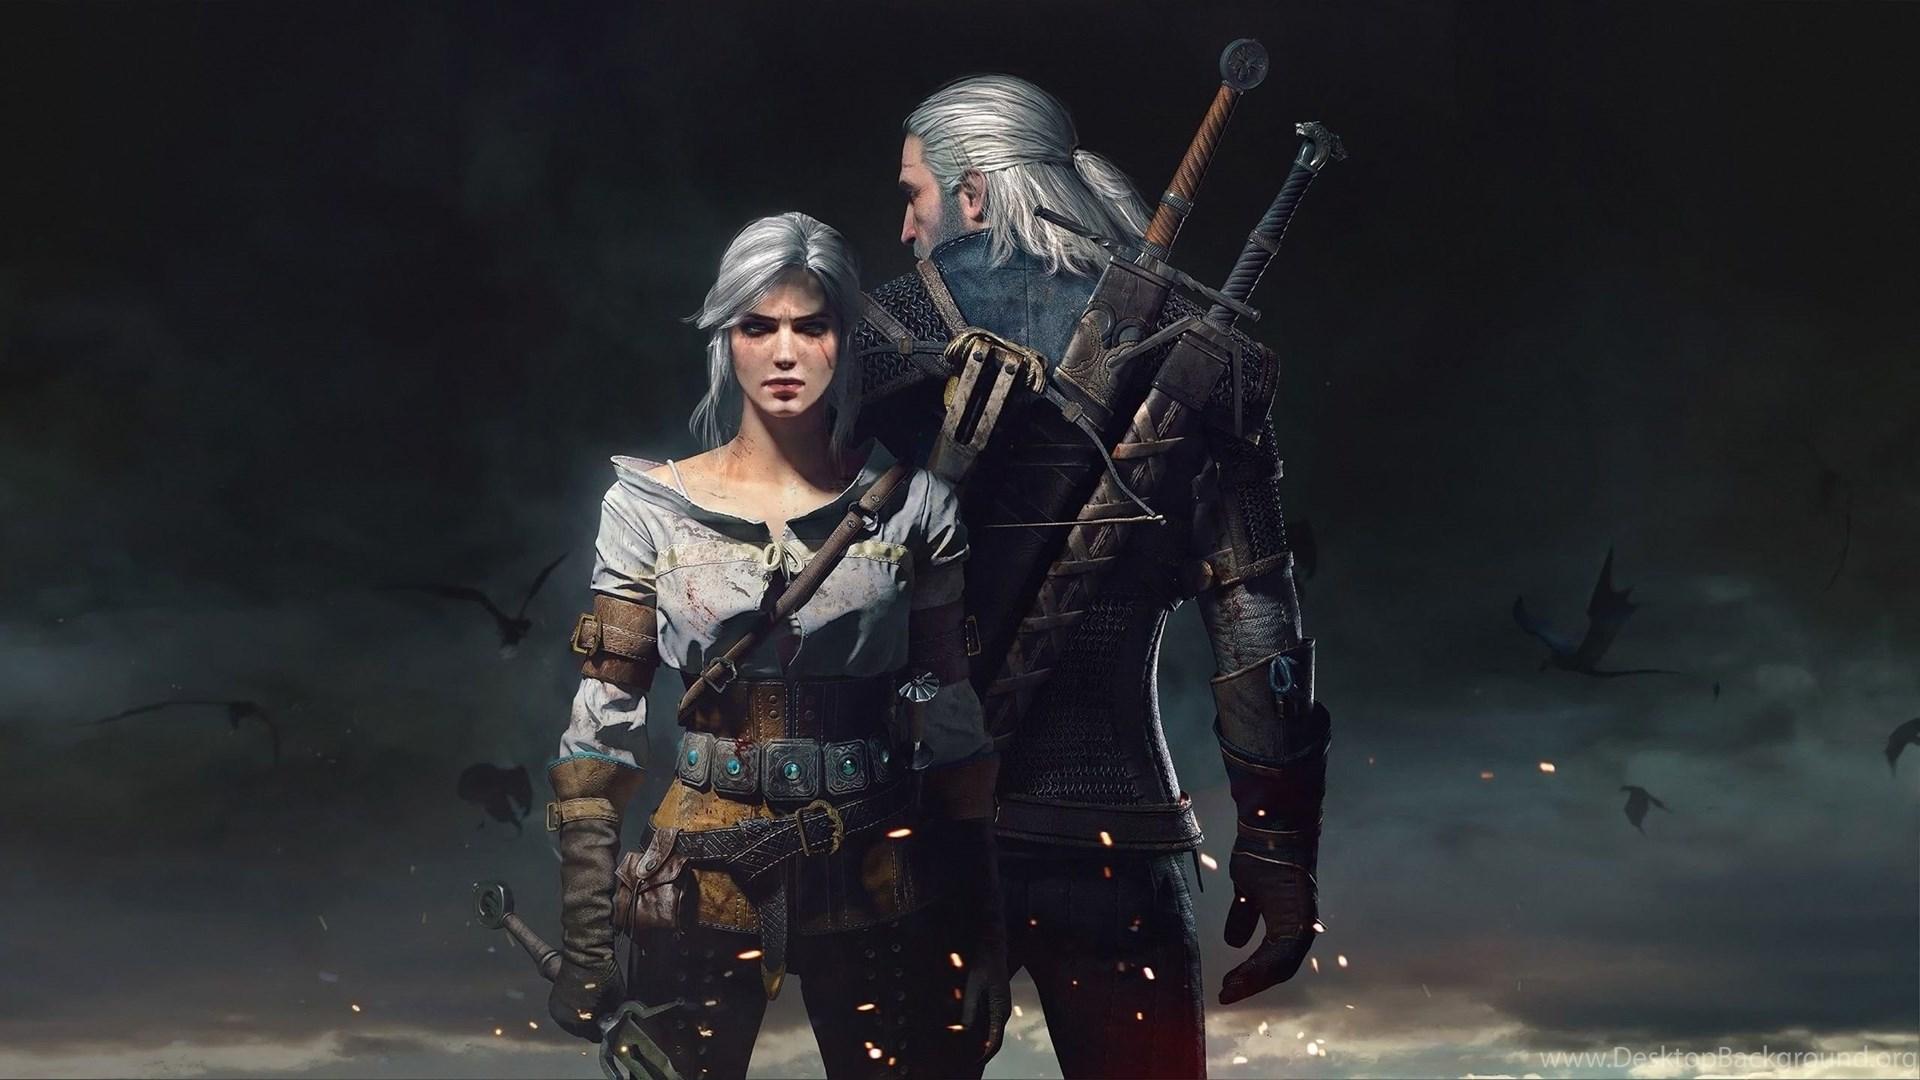 The Witcher 3 Wild Hunt Wallpapers Hd 2 Gallery Desktop Background